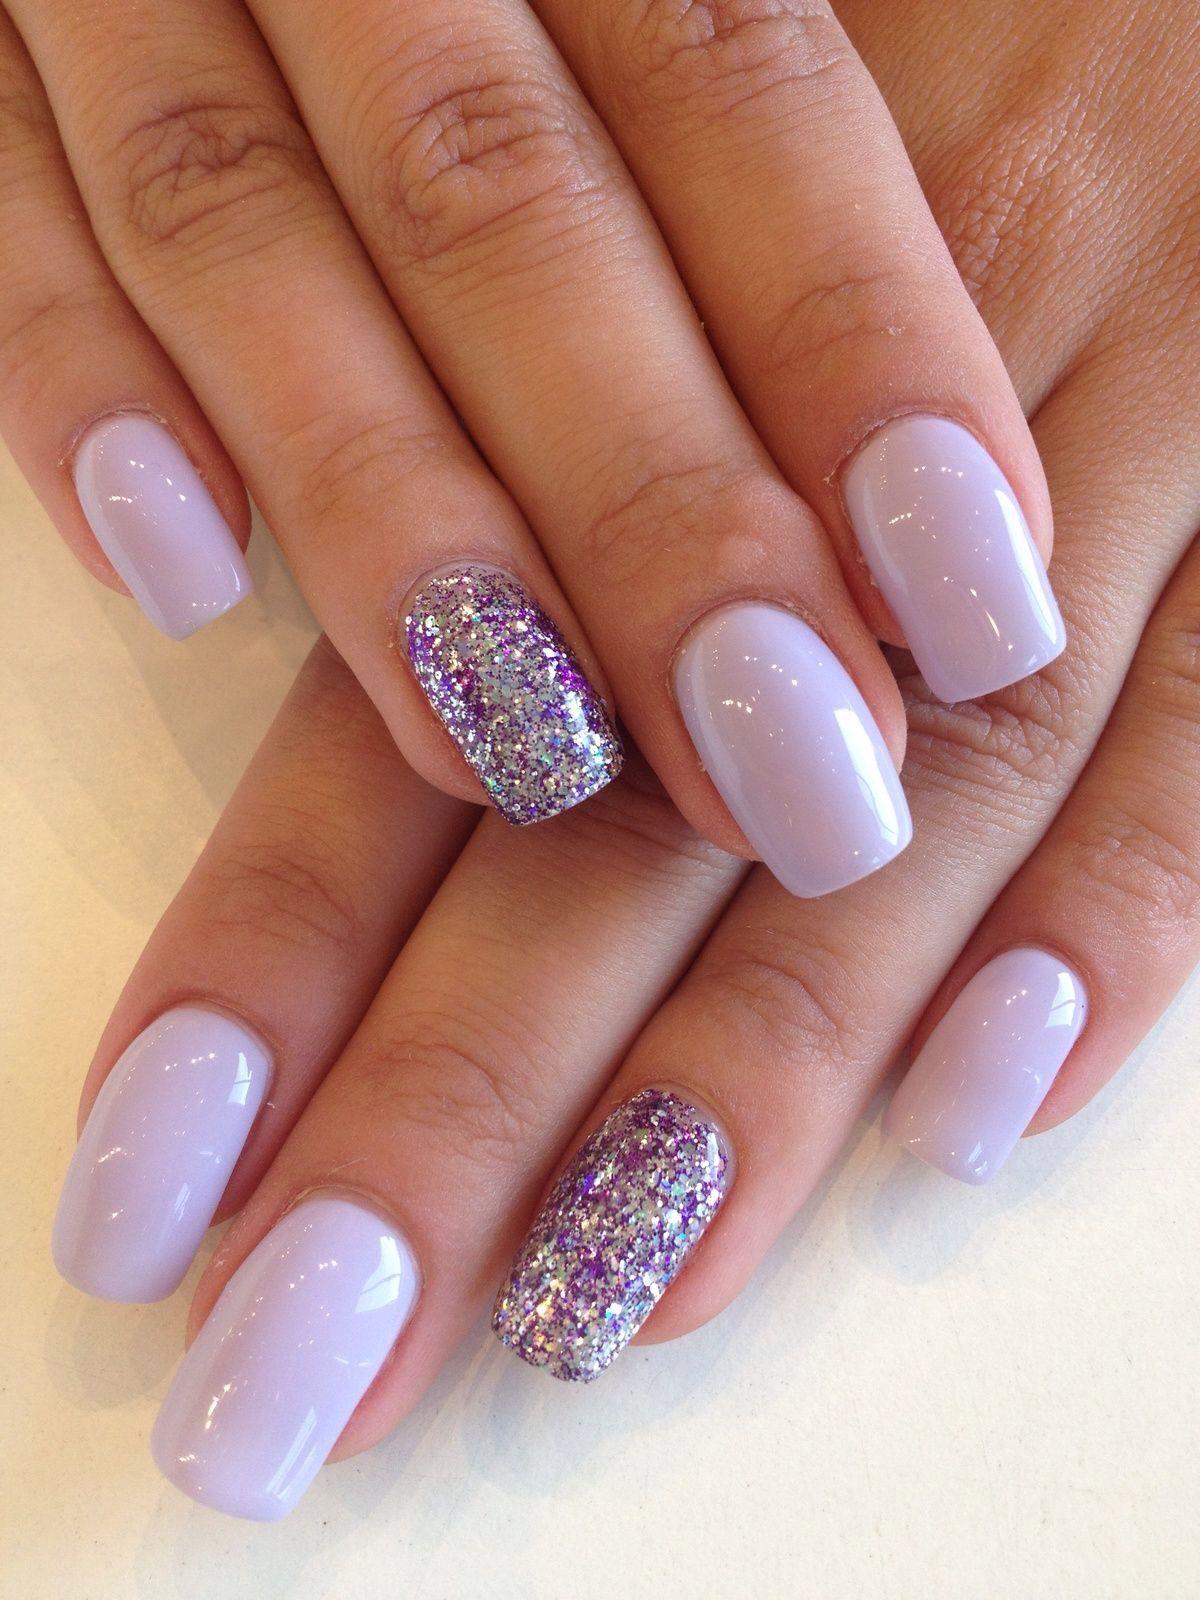 Pin de Johnetta Kizer en Nails☝   Pinterest   Diseños de uñas ...